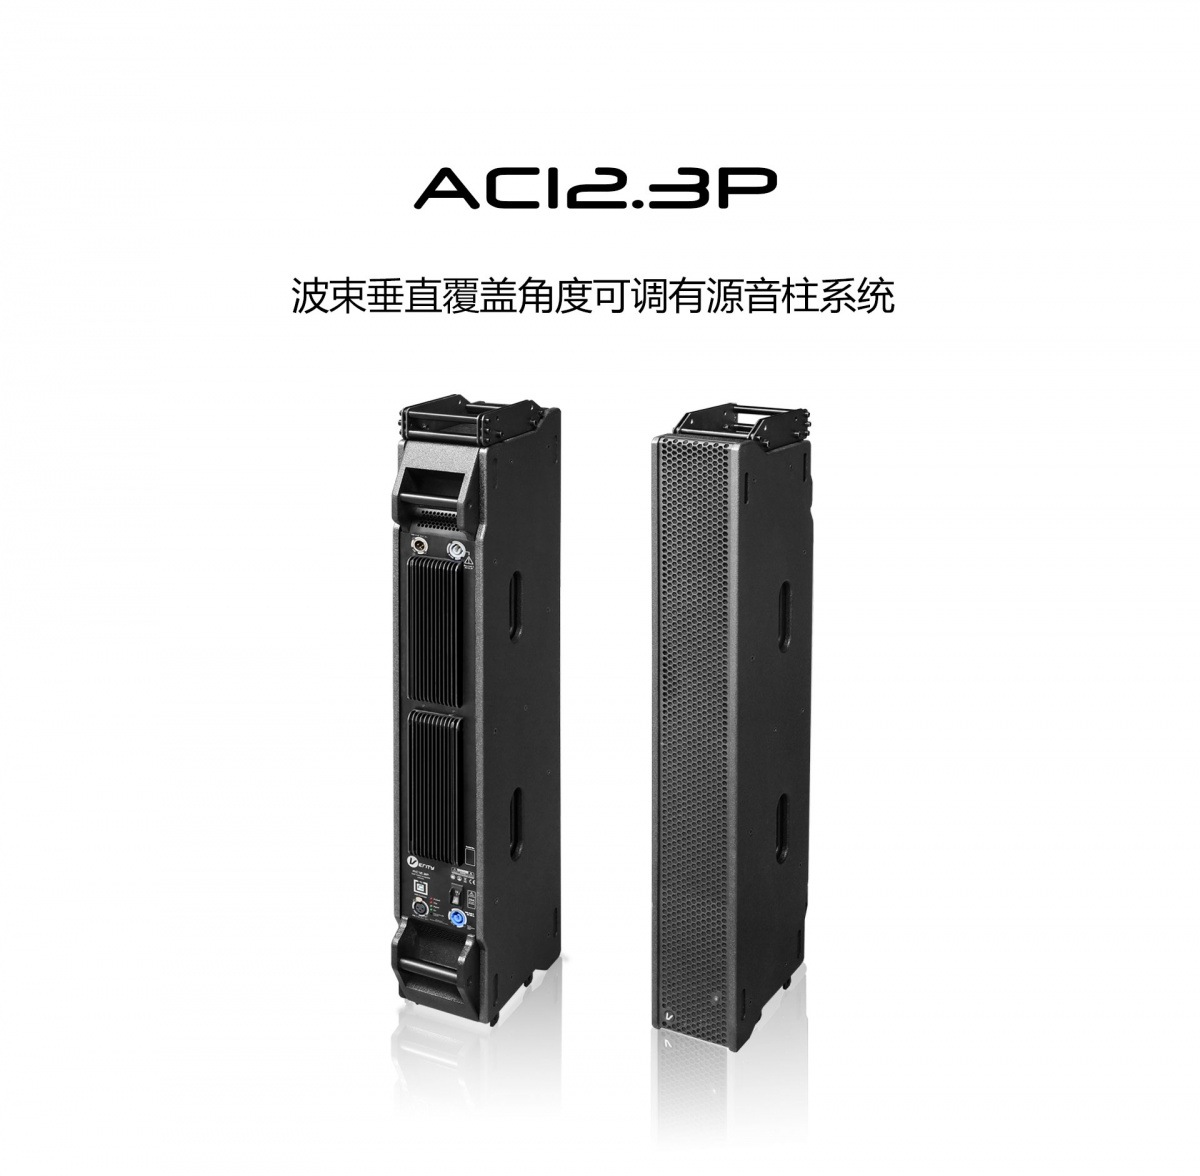 AC12.3P.jpg